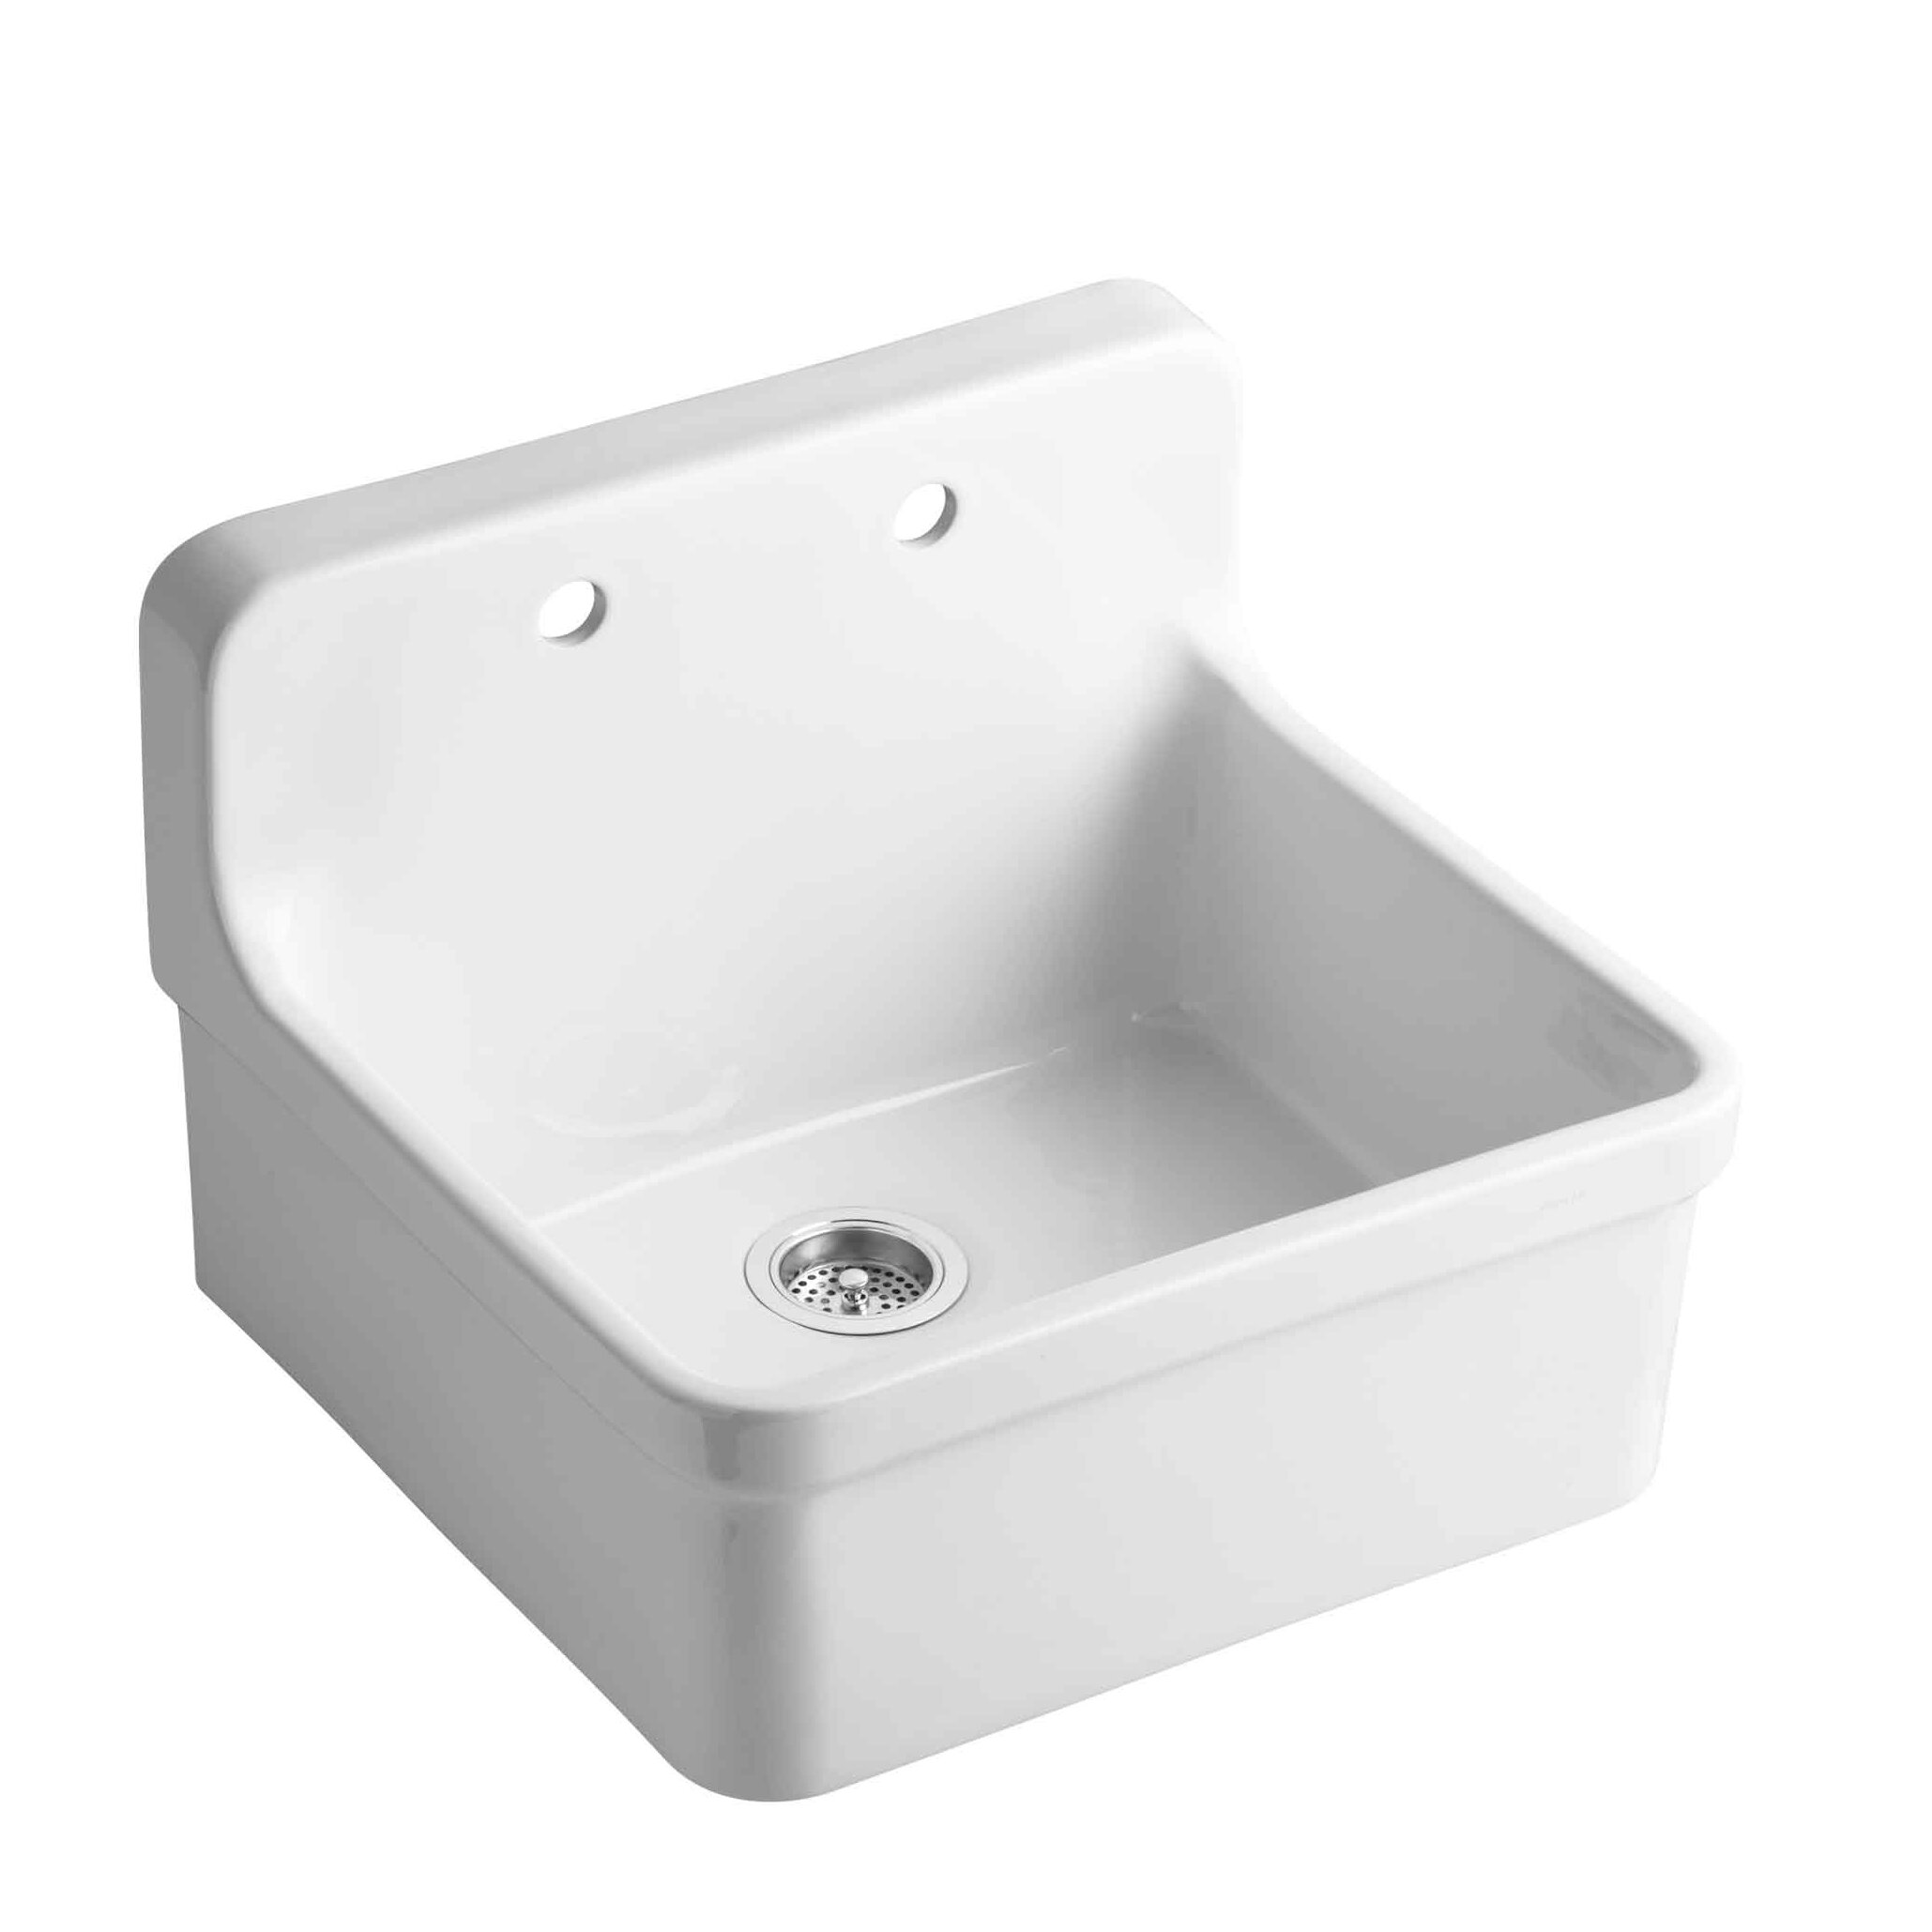 "Top Mount Sink Kitchen: Kohler Gilford 24"" X 22"" X 9-1/2"" Wall-Mount/Top-Mount"